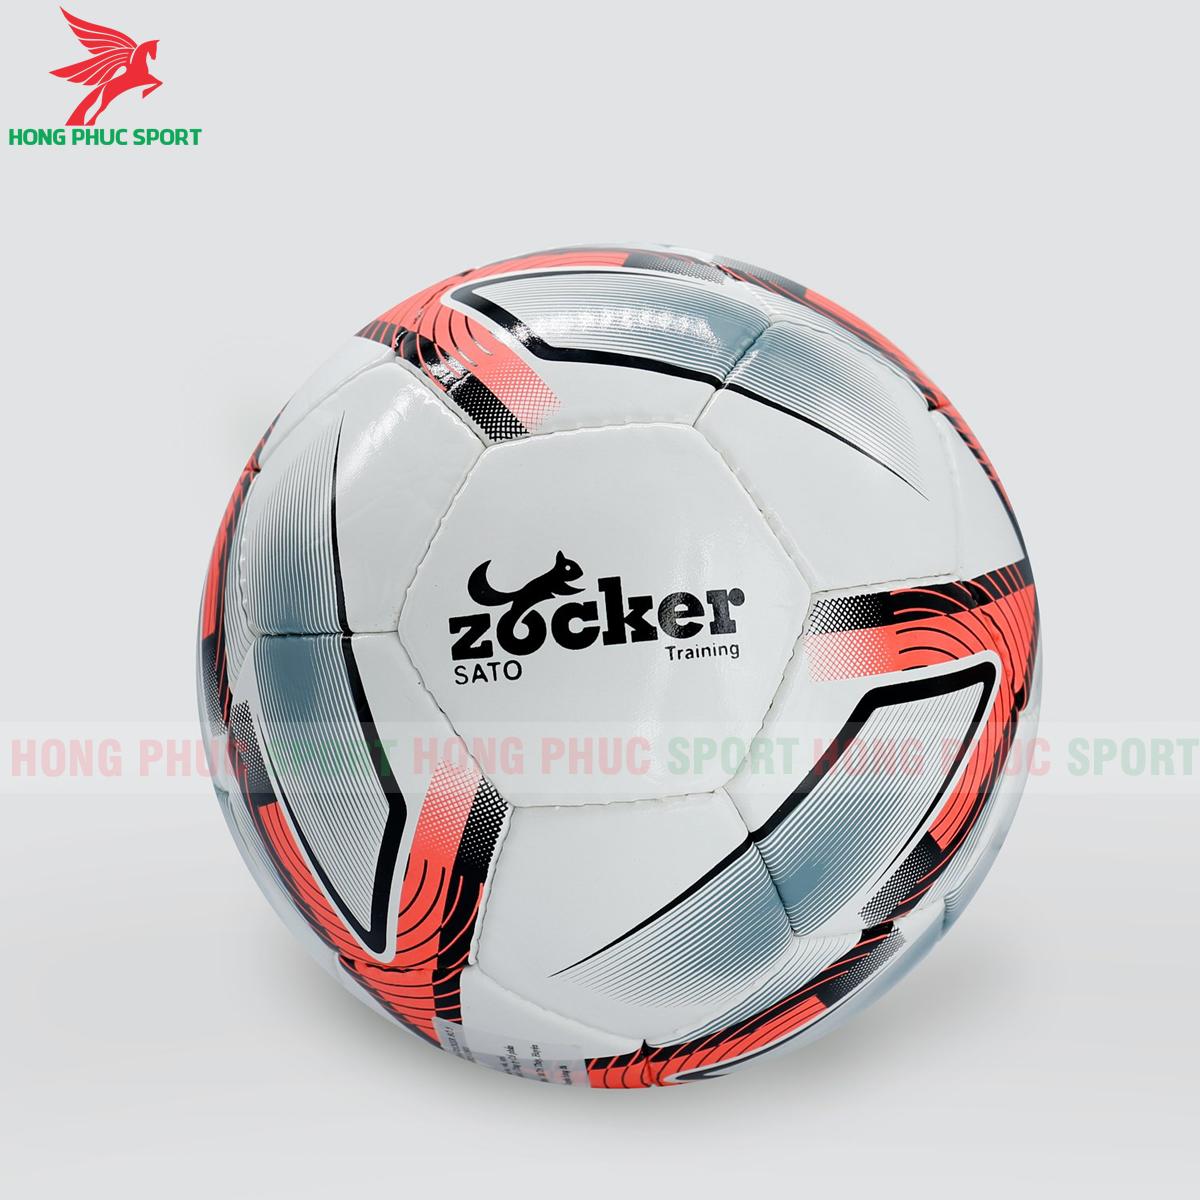 https://cdn.hongphucsport.com/unsafe/s4.shopbay.vn/files/285/qua-bong-da-zocker-sato-s1901-mau-cam-60751ae1b5b2c.png